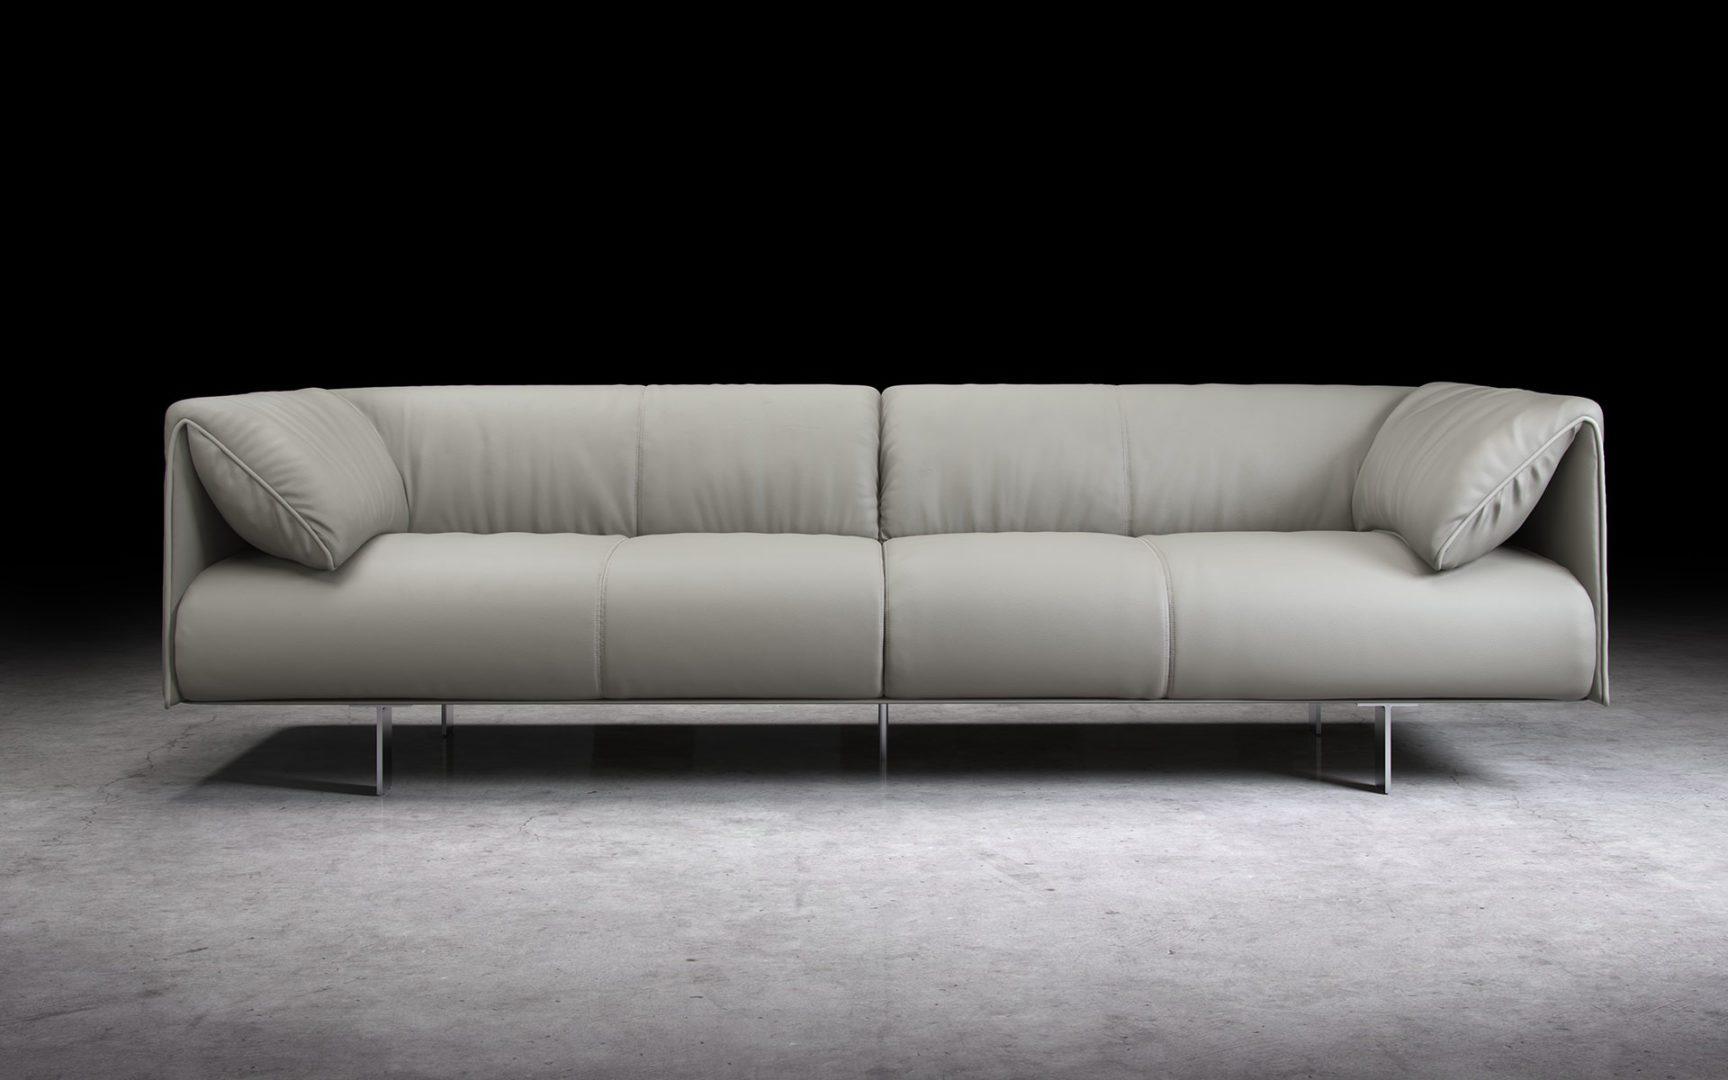 Essex-Sofa-Silo-Matte-Opala-Frontal-1080